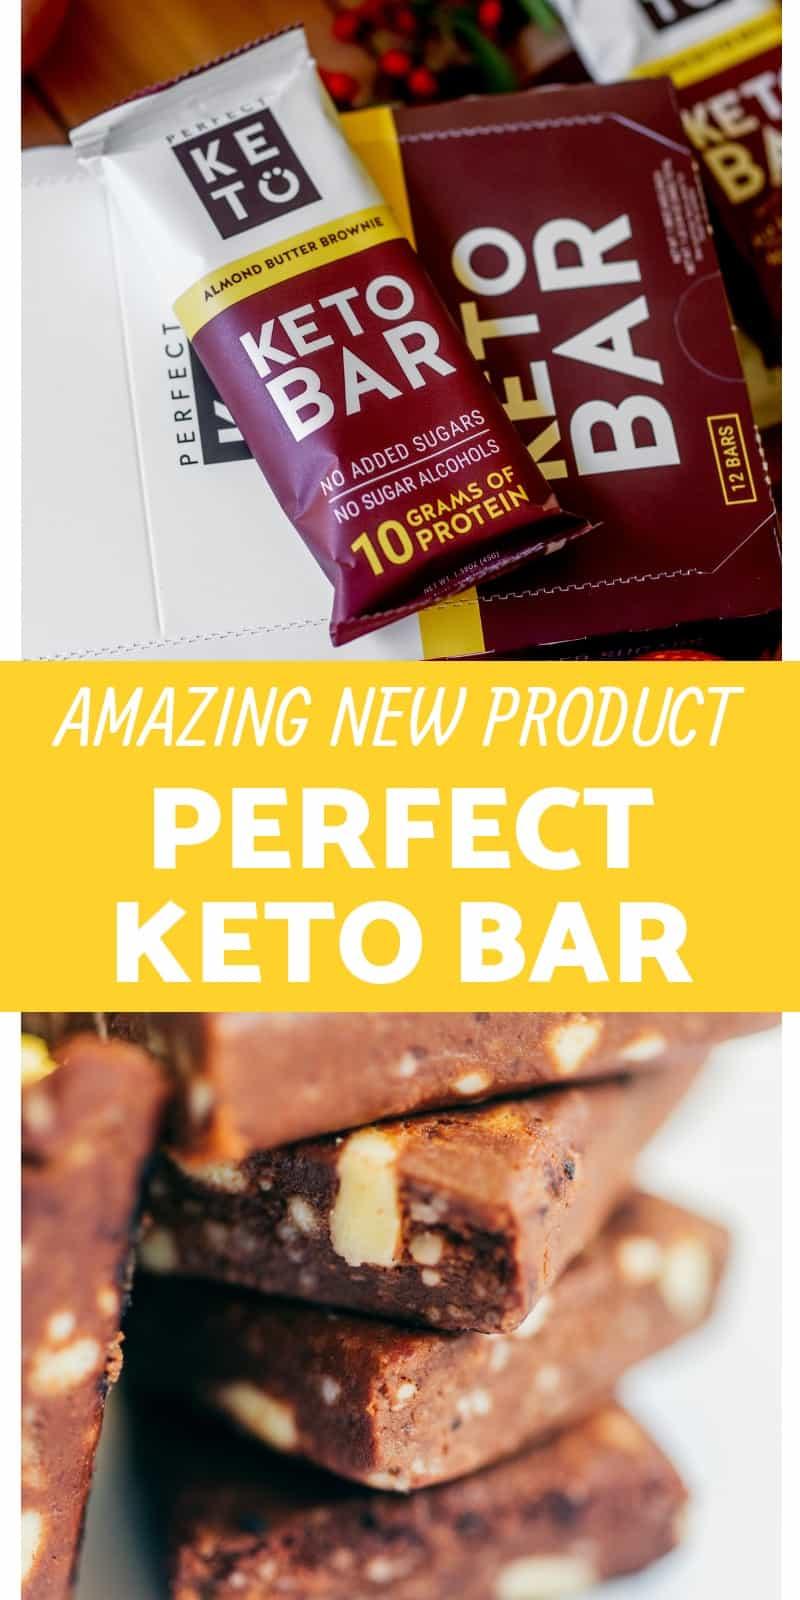 Perfect Keto Bar Products